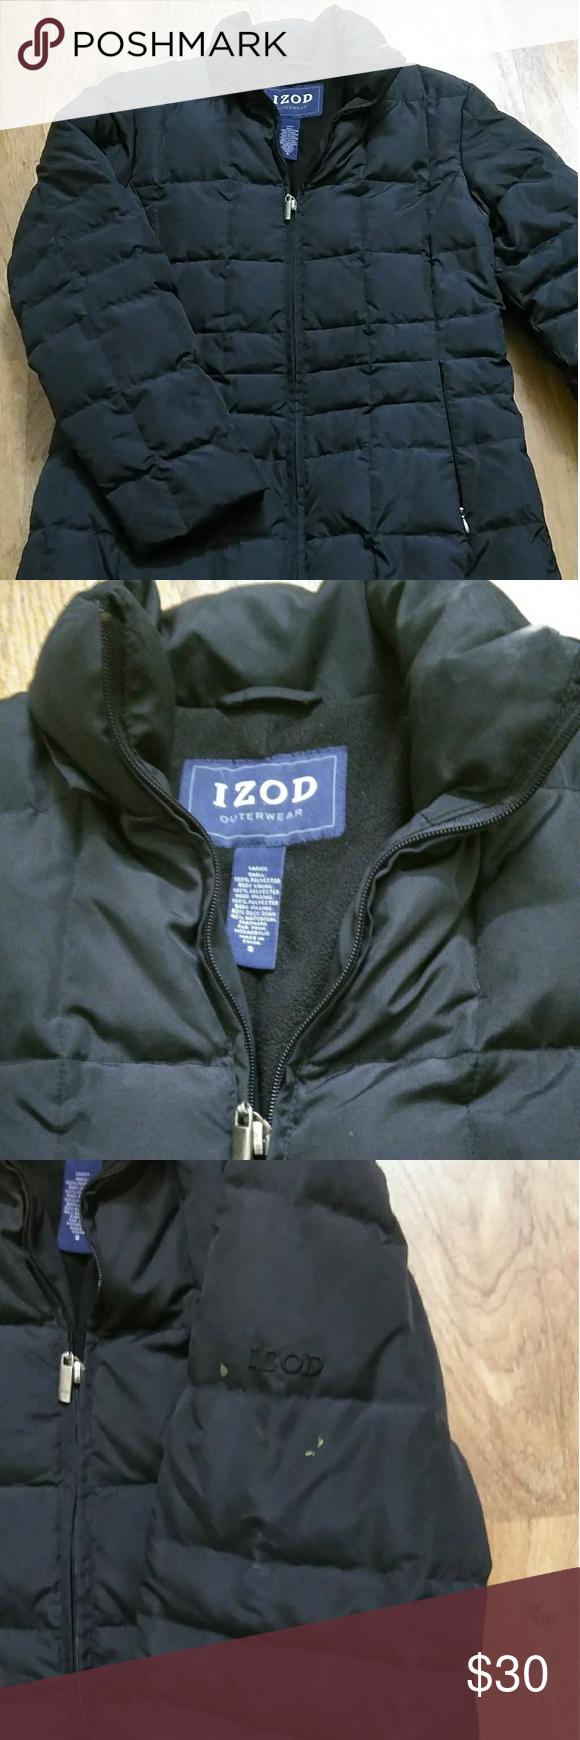 Izod Down Fill Coat Coats For Women Clothes Design Jackets For Women [ 1740 x 580 Pixel ]